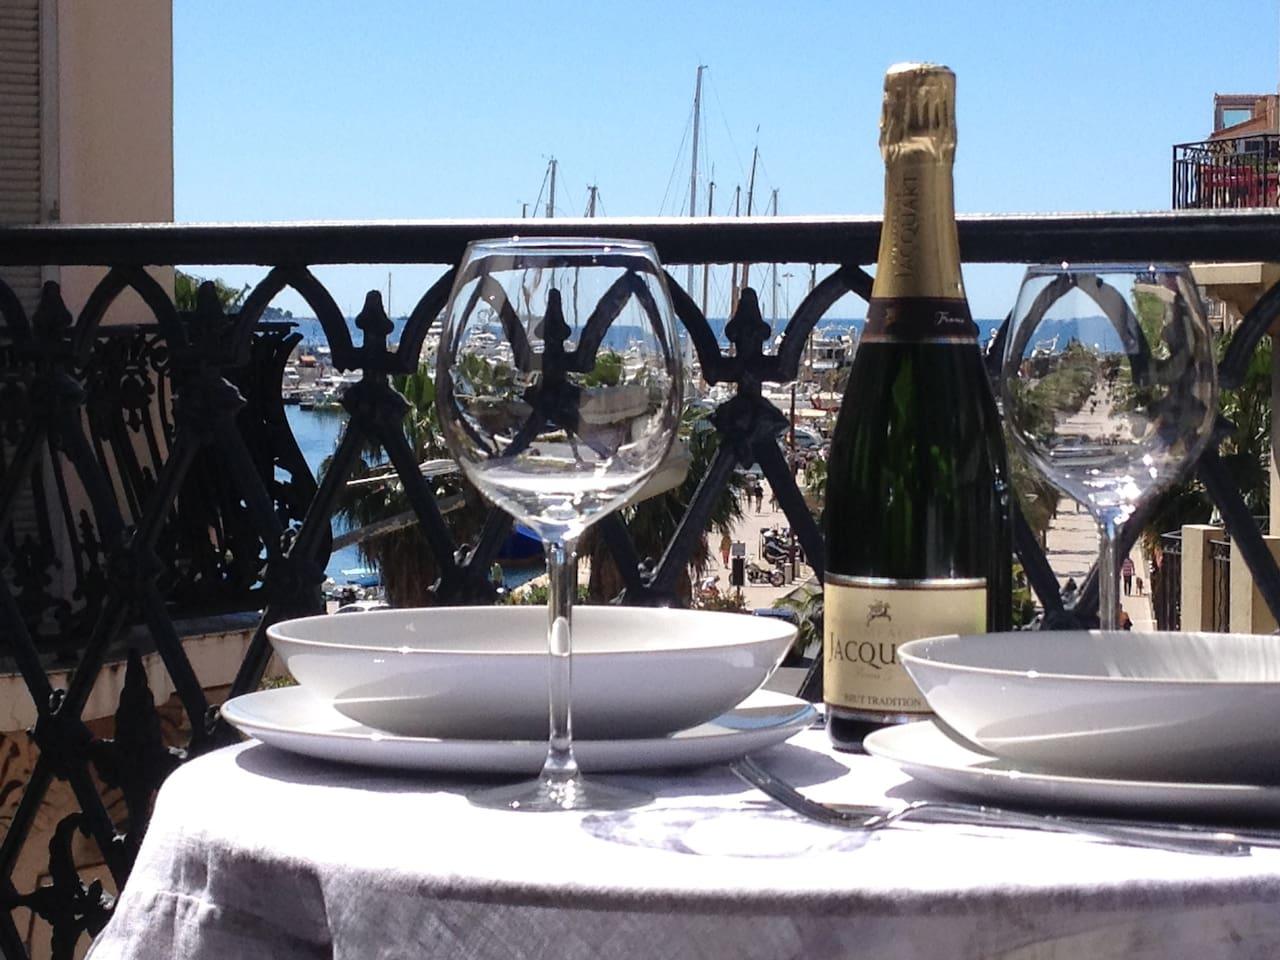 Enjoy an aperitivo or café on our Seaview Terrace